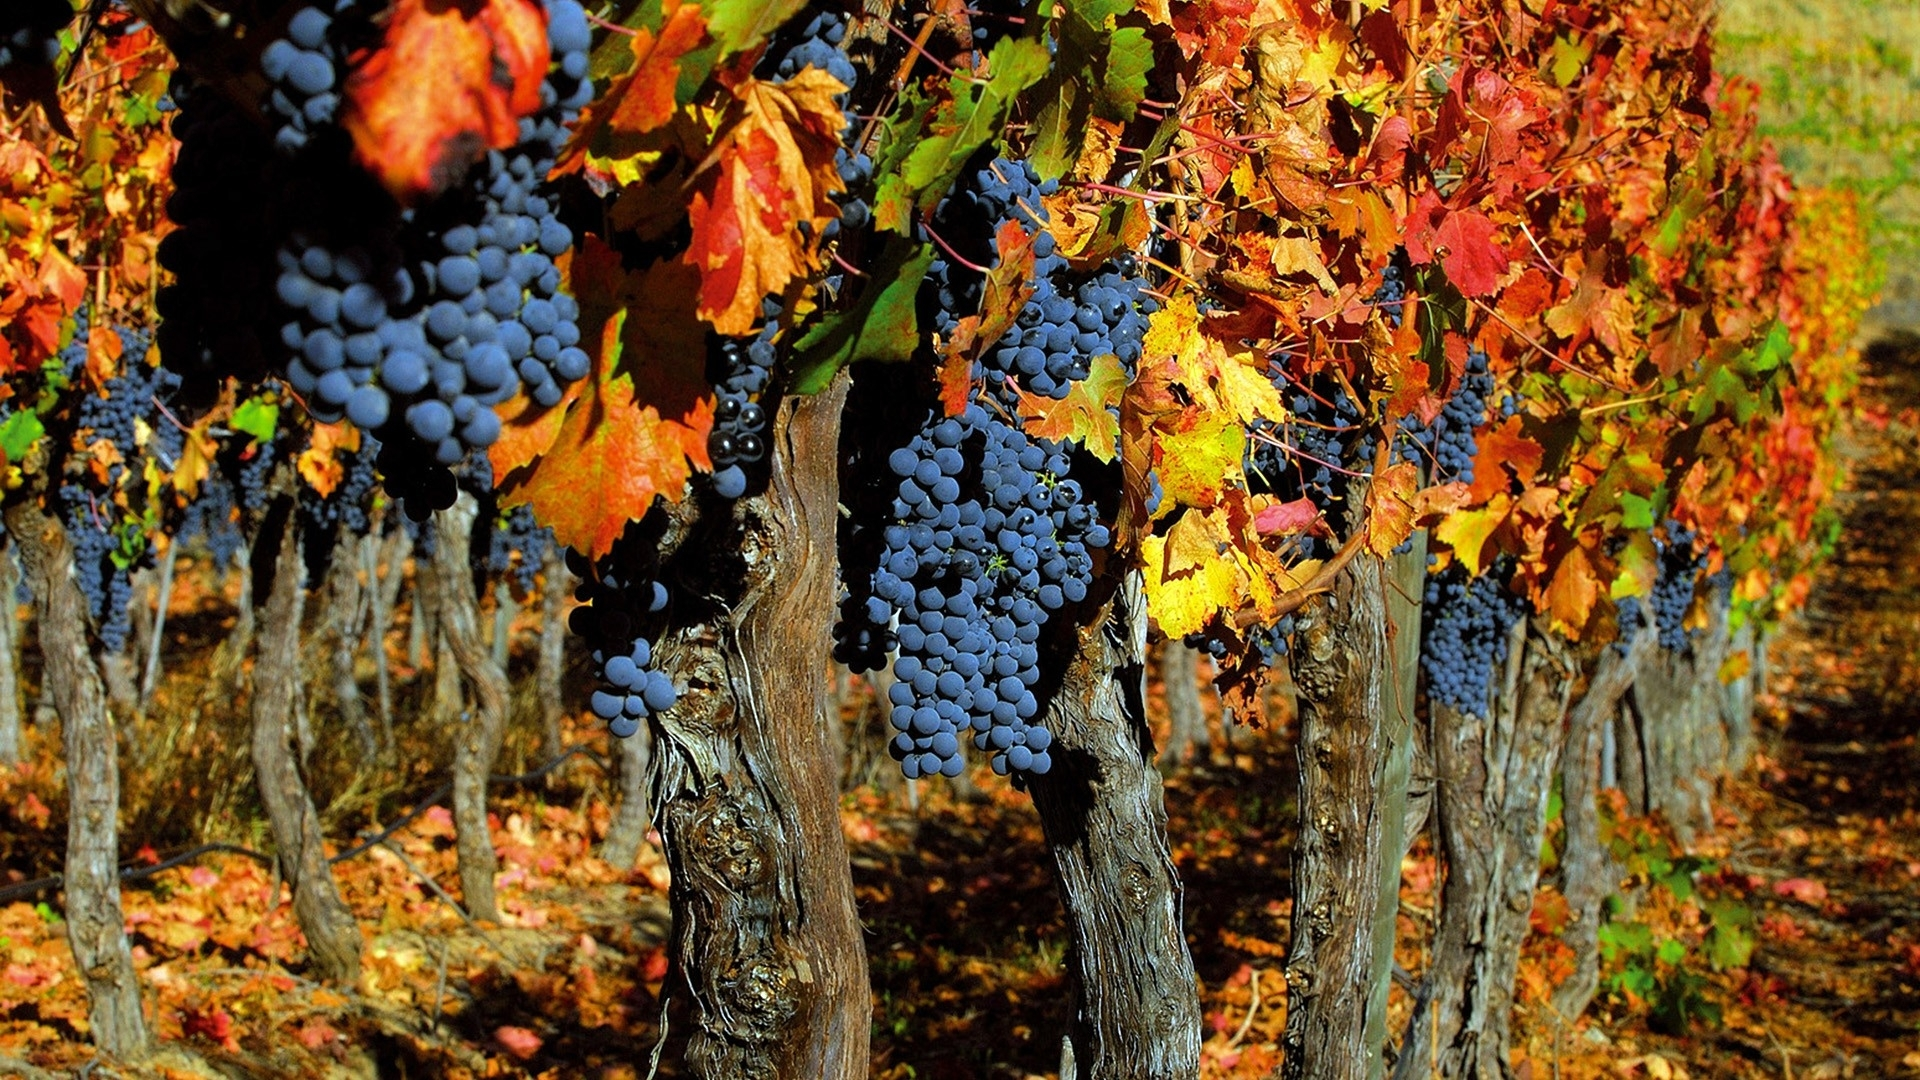 Colorful Food Wallpaper Free Download: Grapes Orchard Harvest Food Fruit Plants Leaves Color